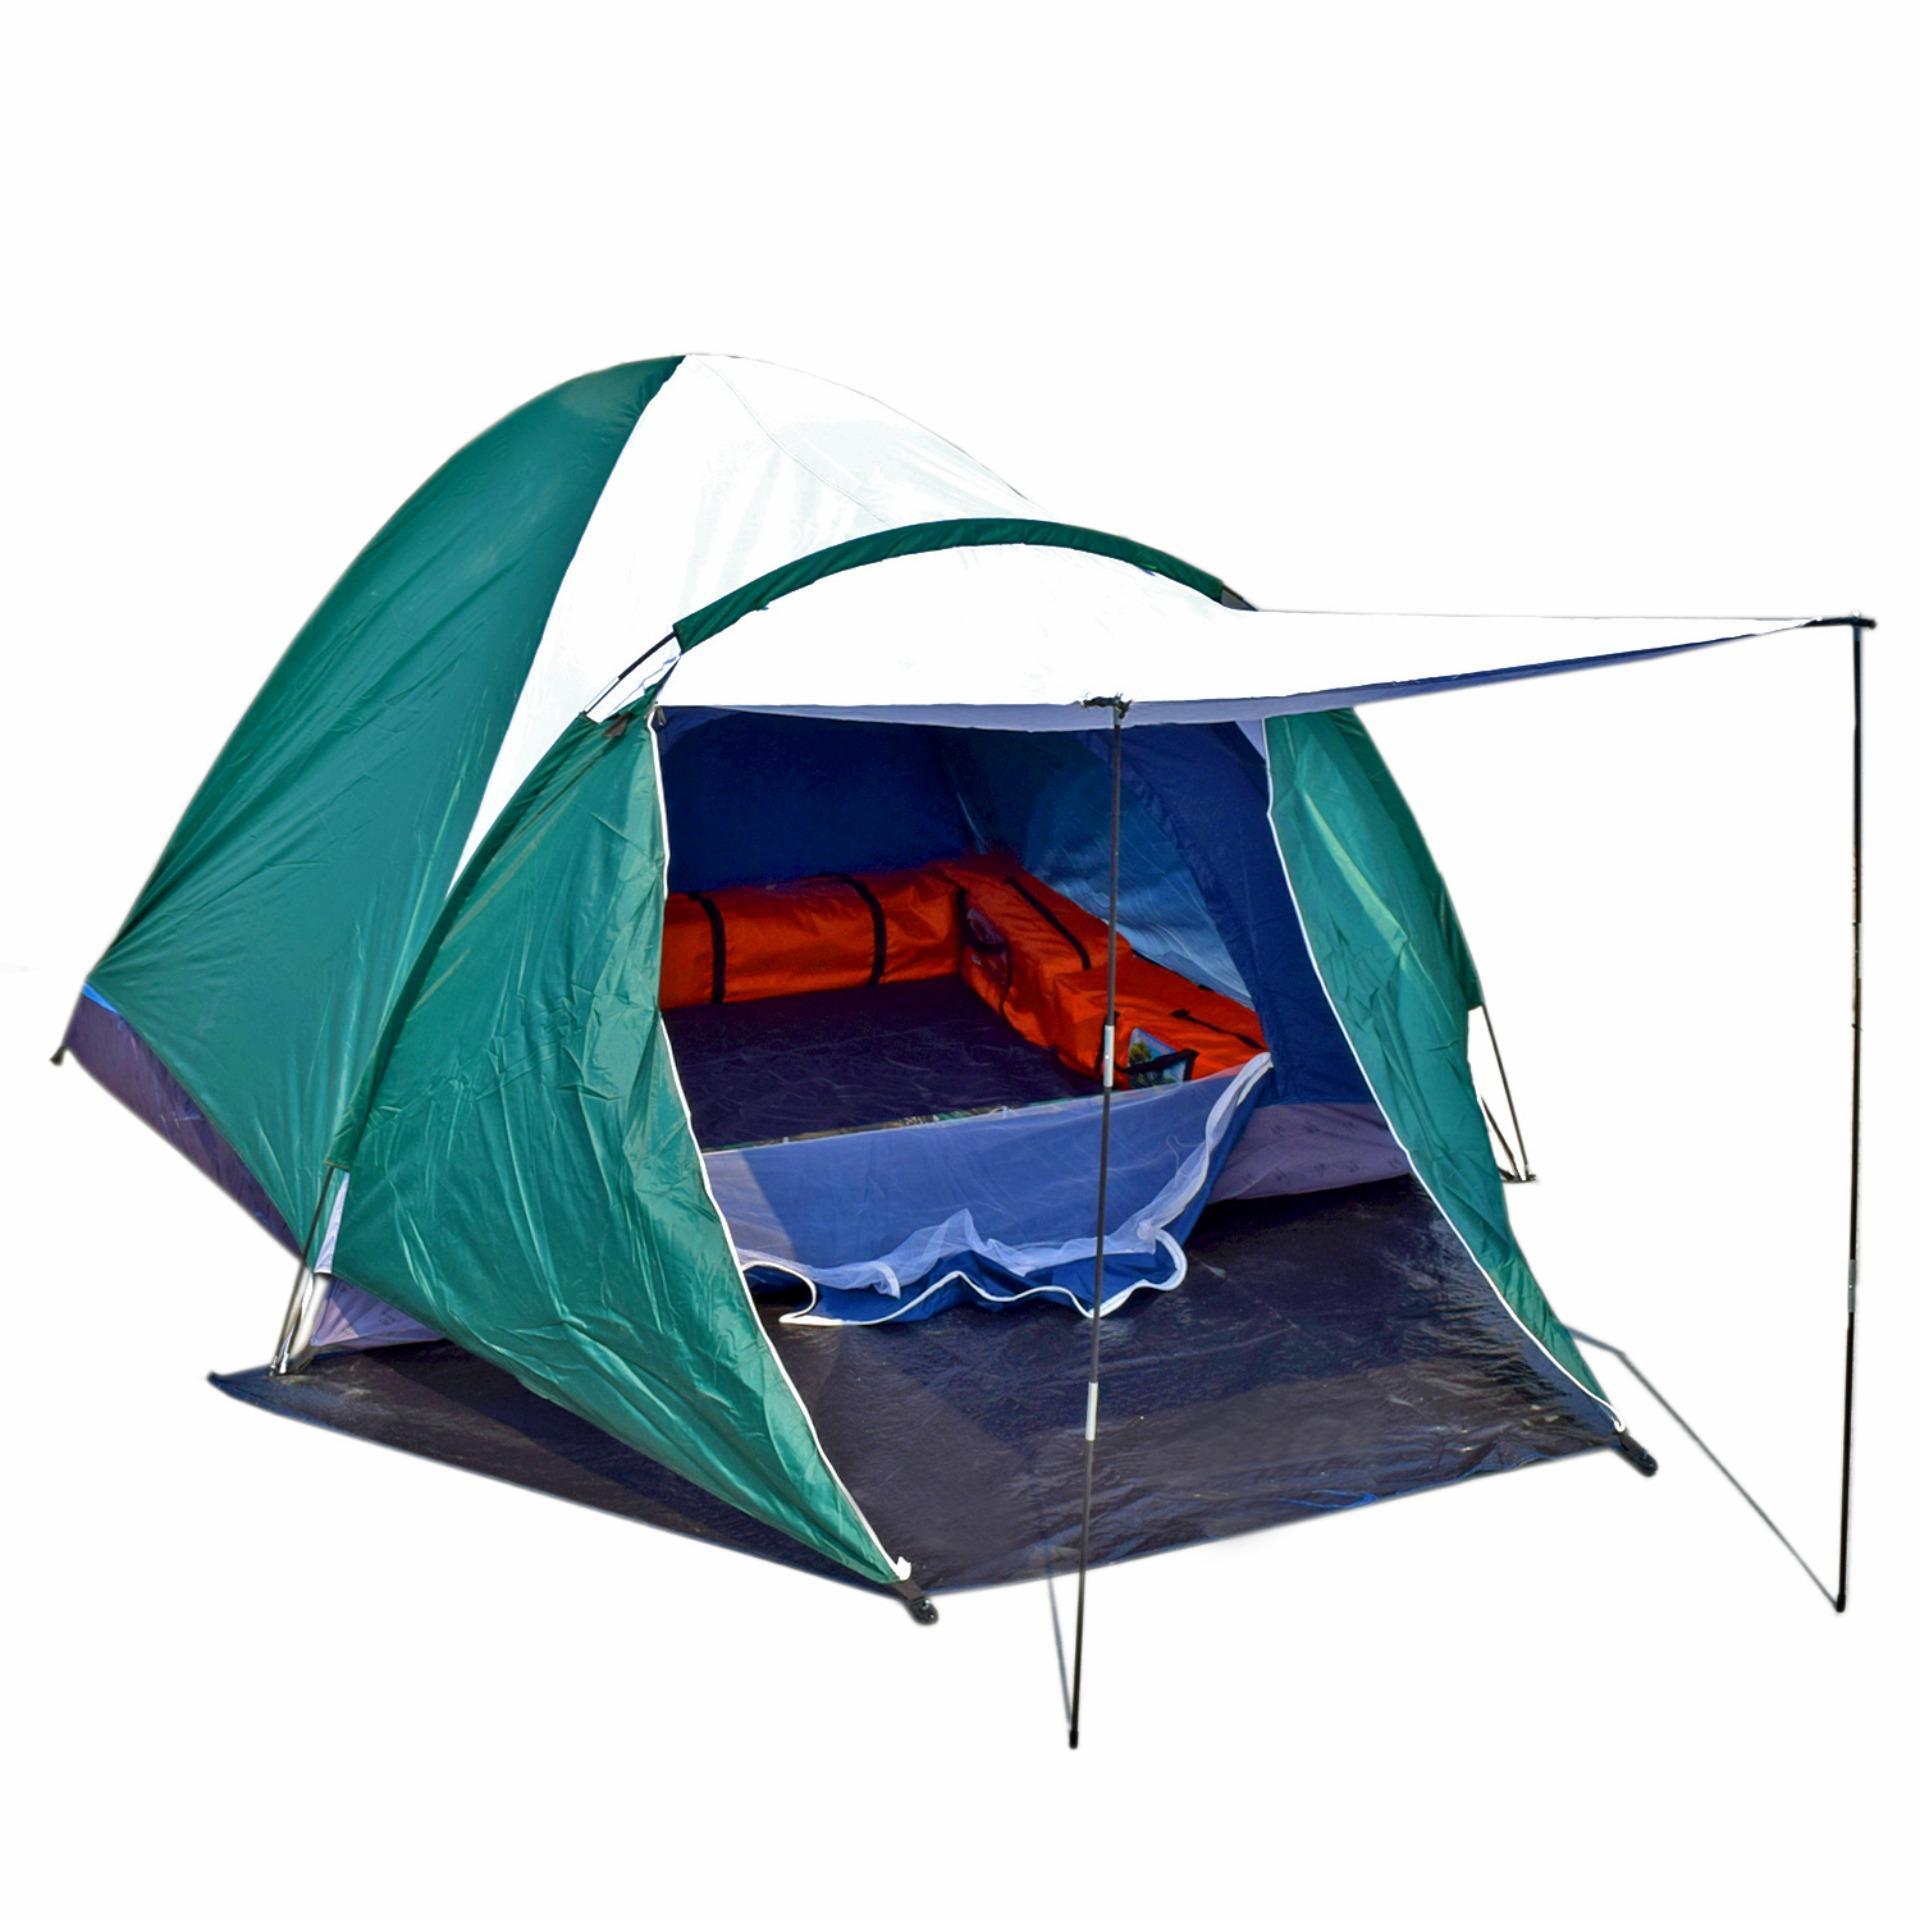 Matougui WS004 Tenda Camping Hiking Dewasa Double Layer Kapasitas 3 / 4 Orang .